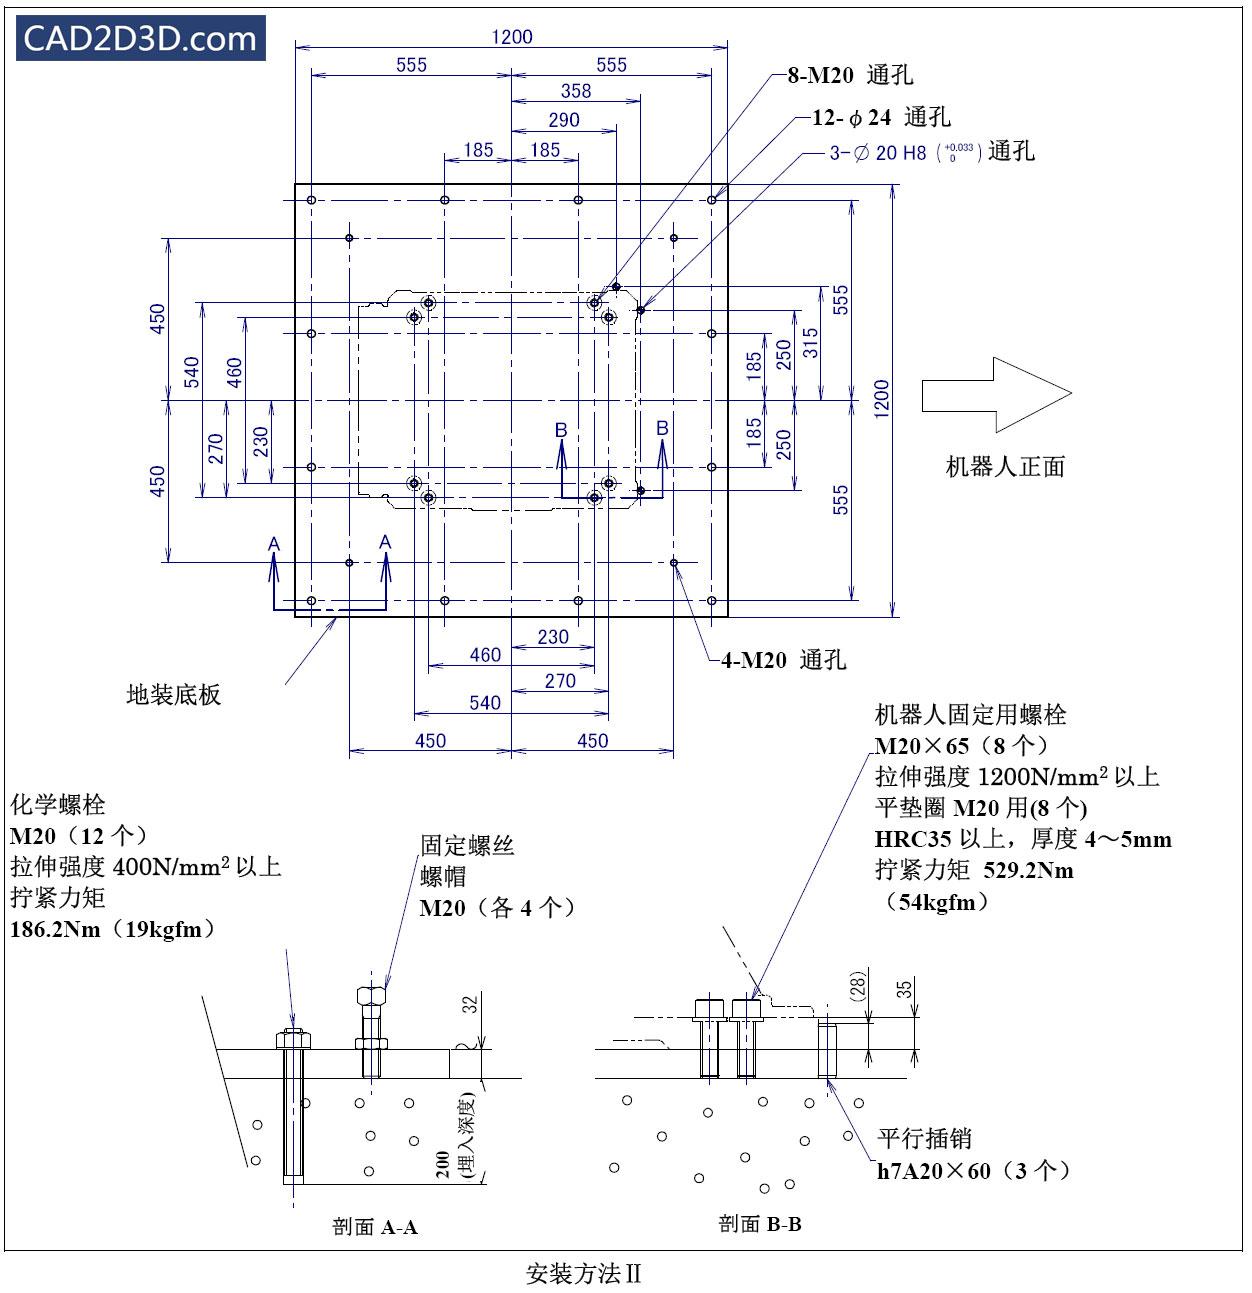 FANUC R-2000iC 系列机器人安装方法及要求